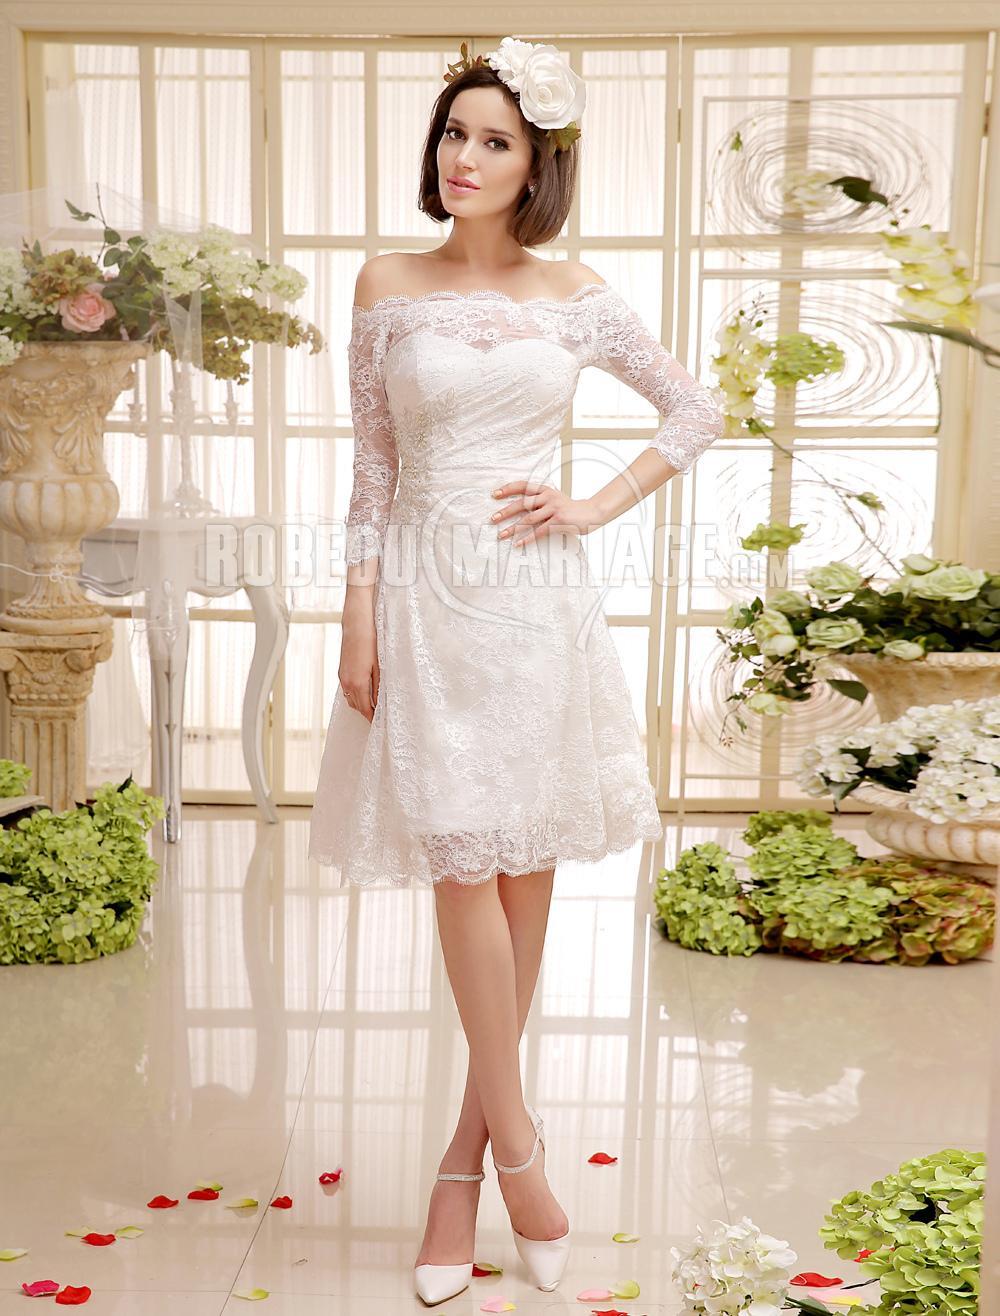 Robe de mariee semi longue